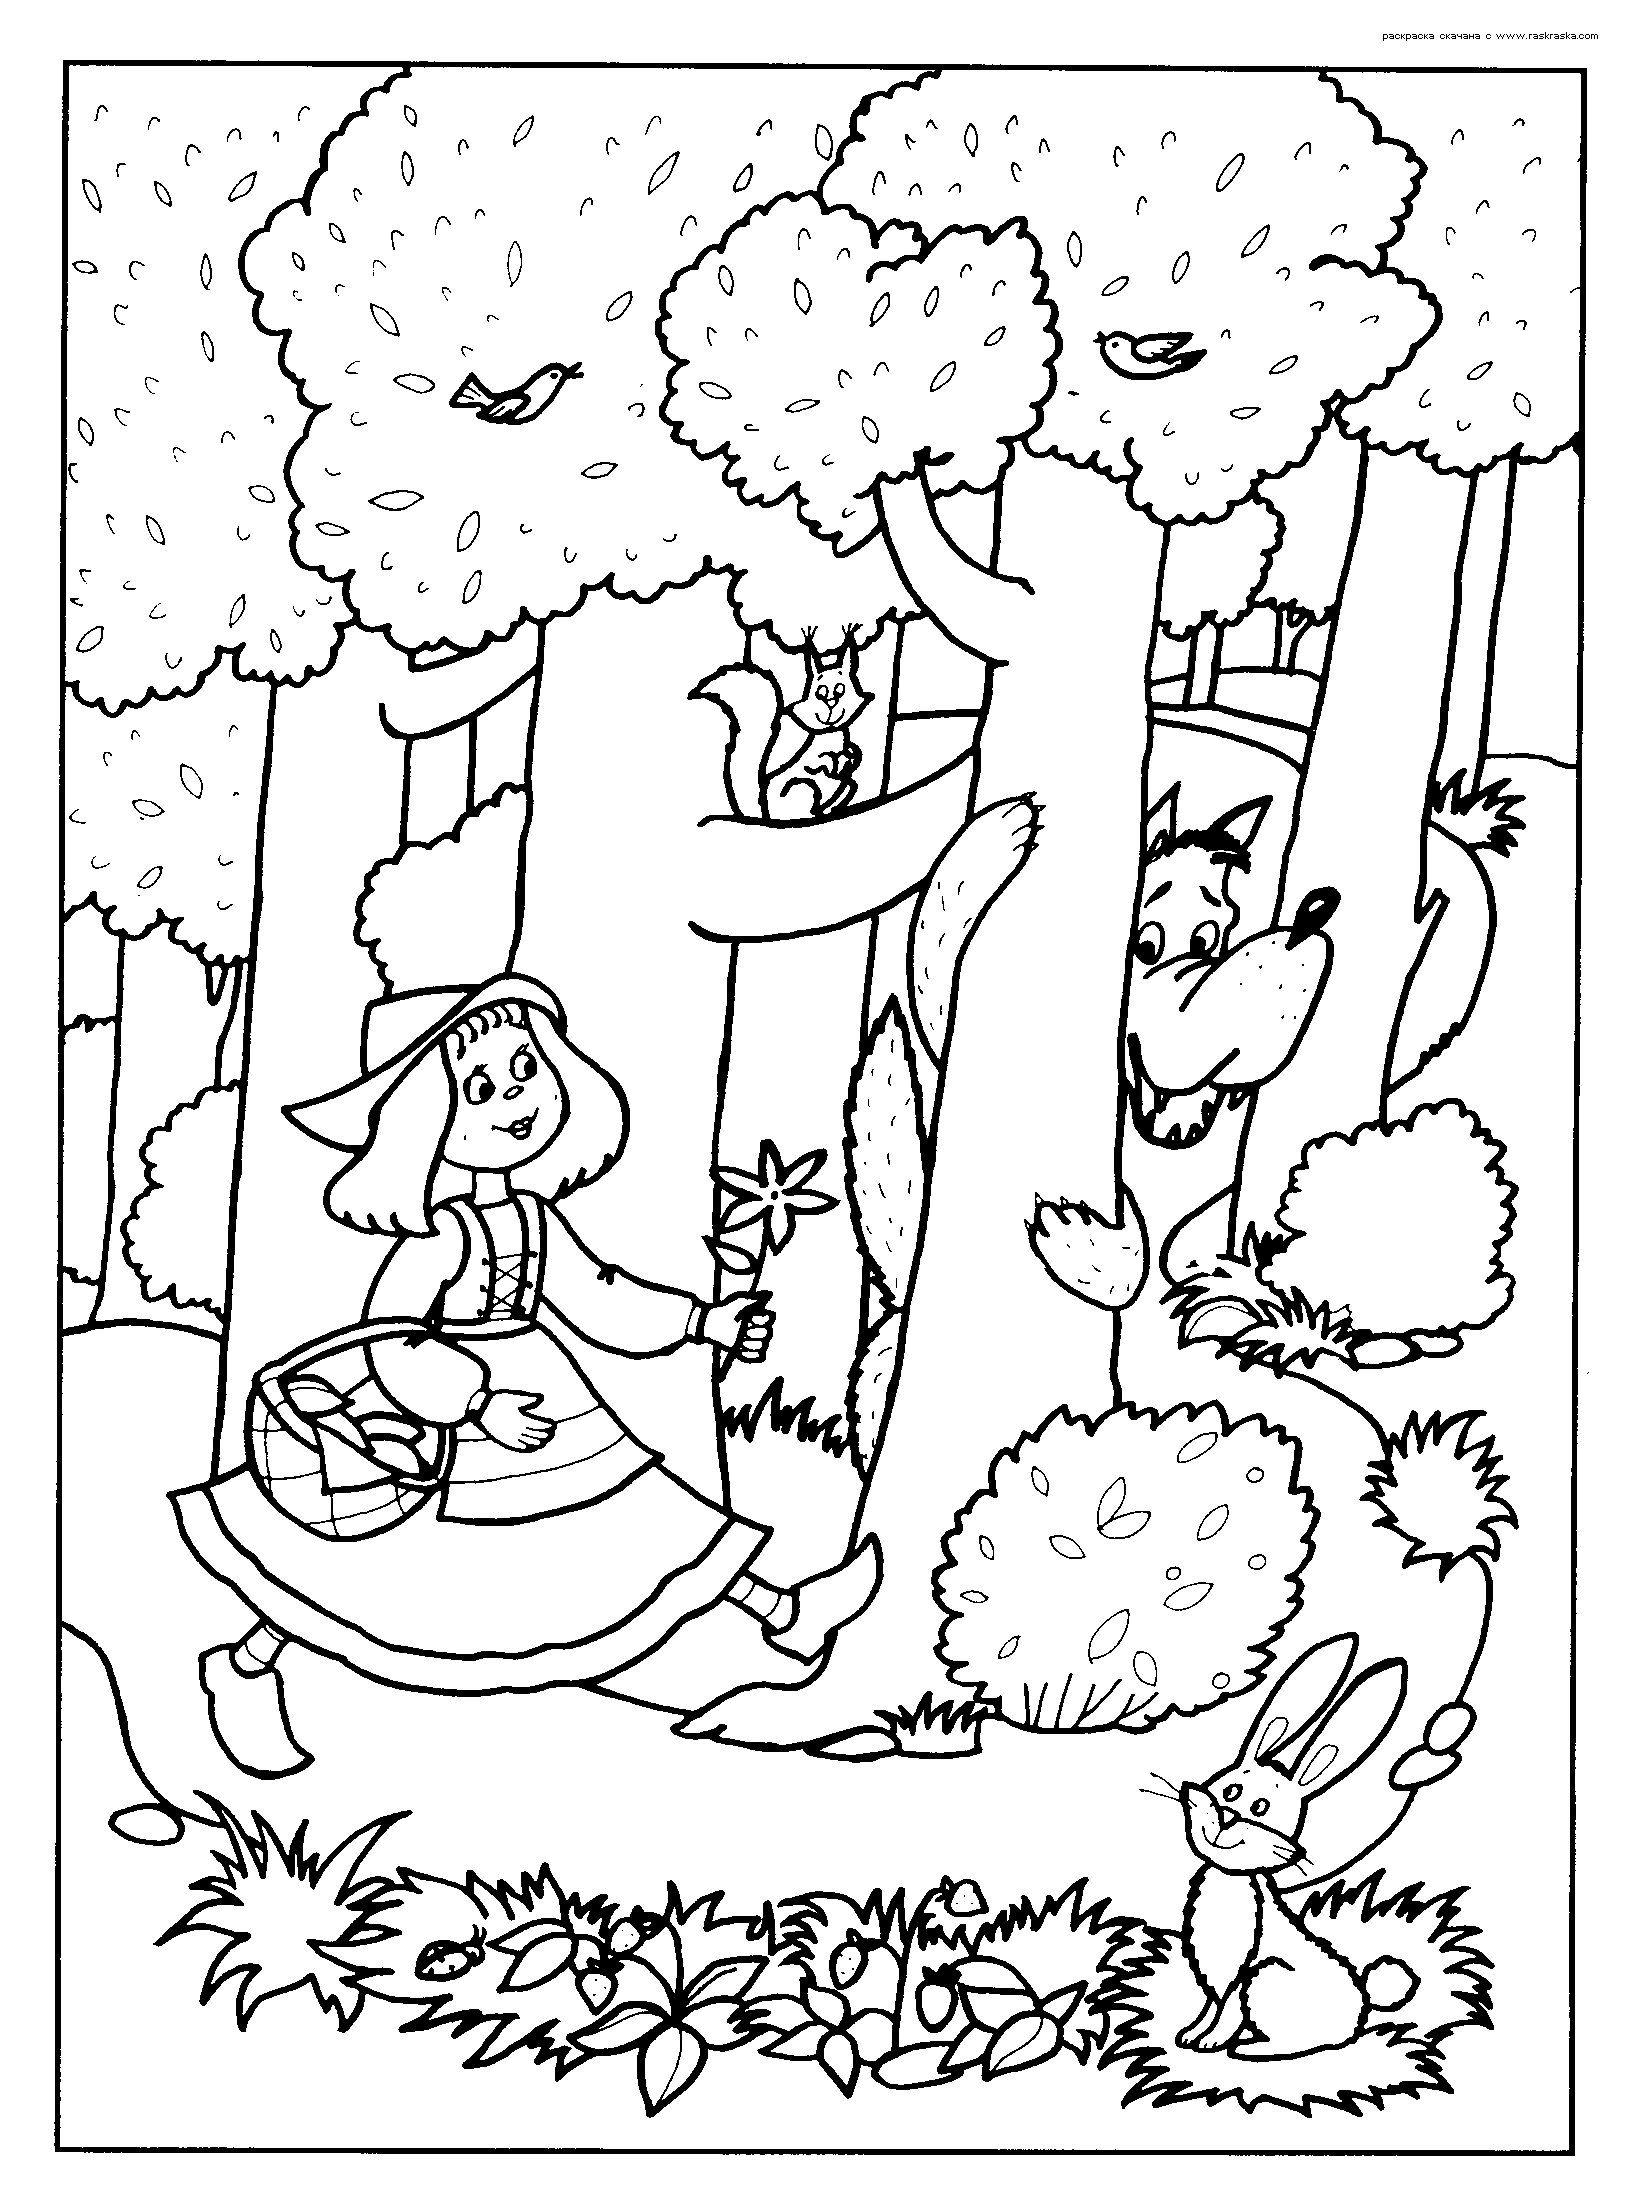 Impressionnant Dessin à Imprimer Petit Loup Mademoiselleosakicom